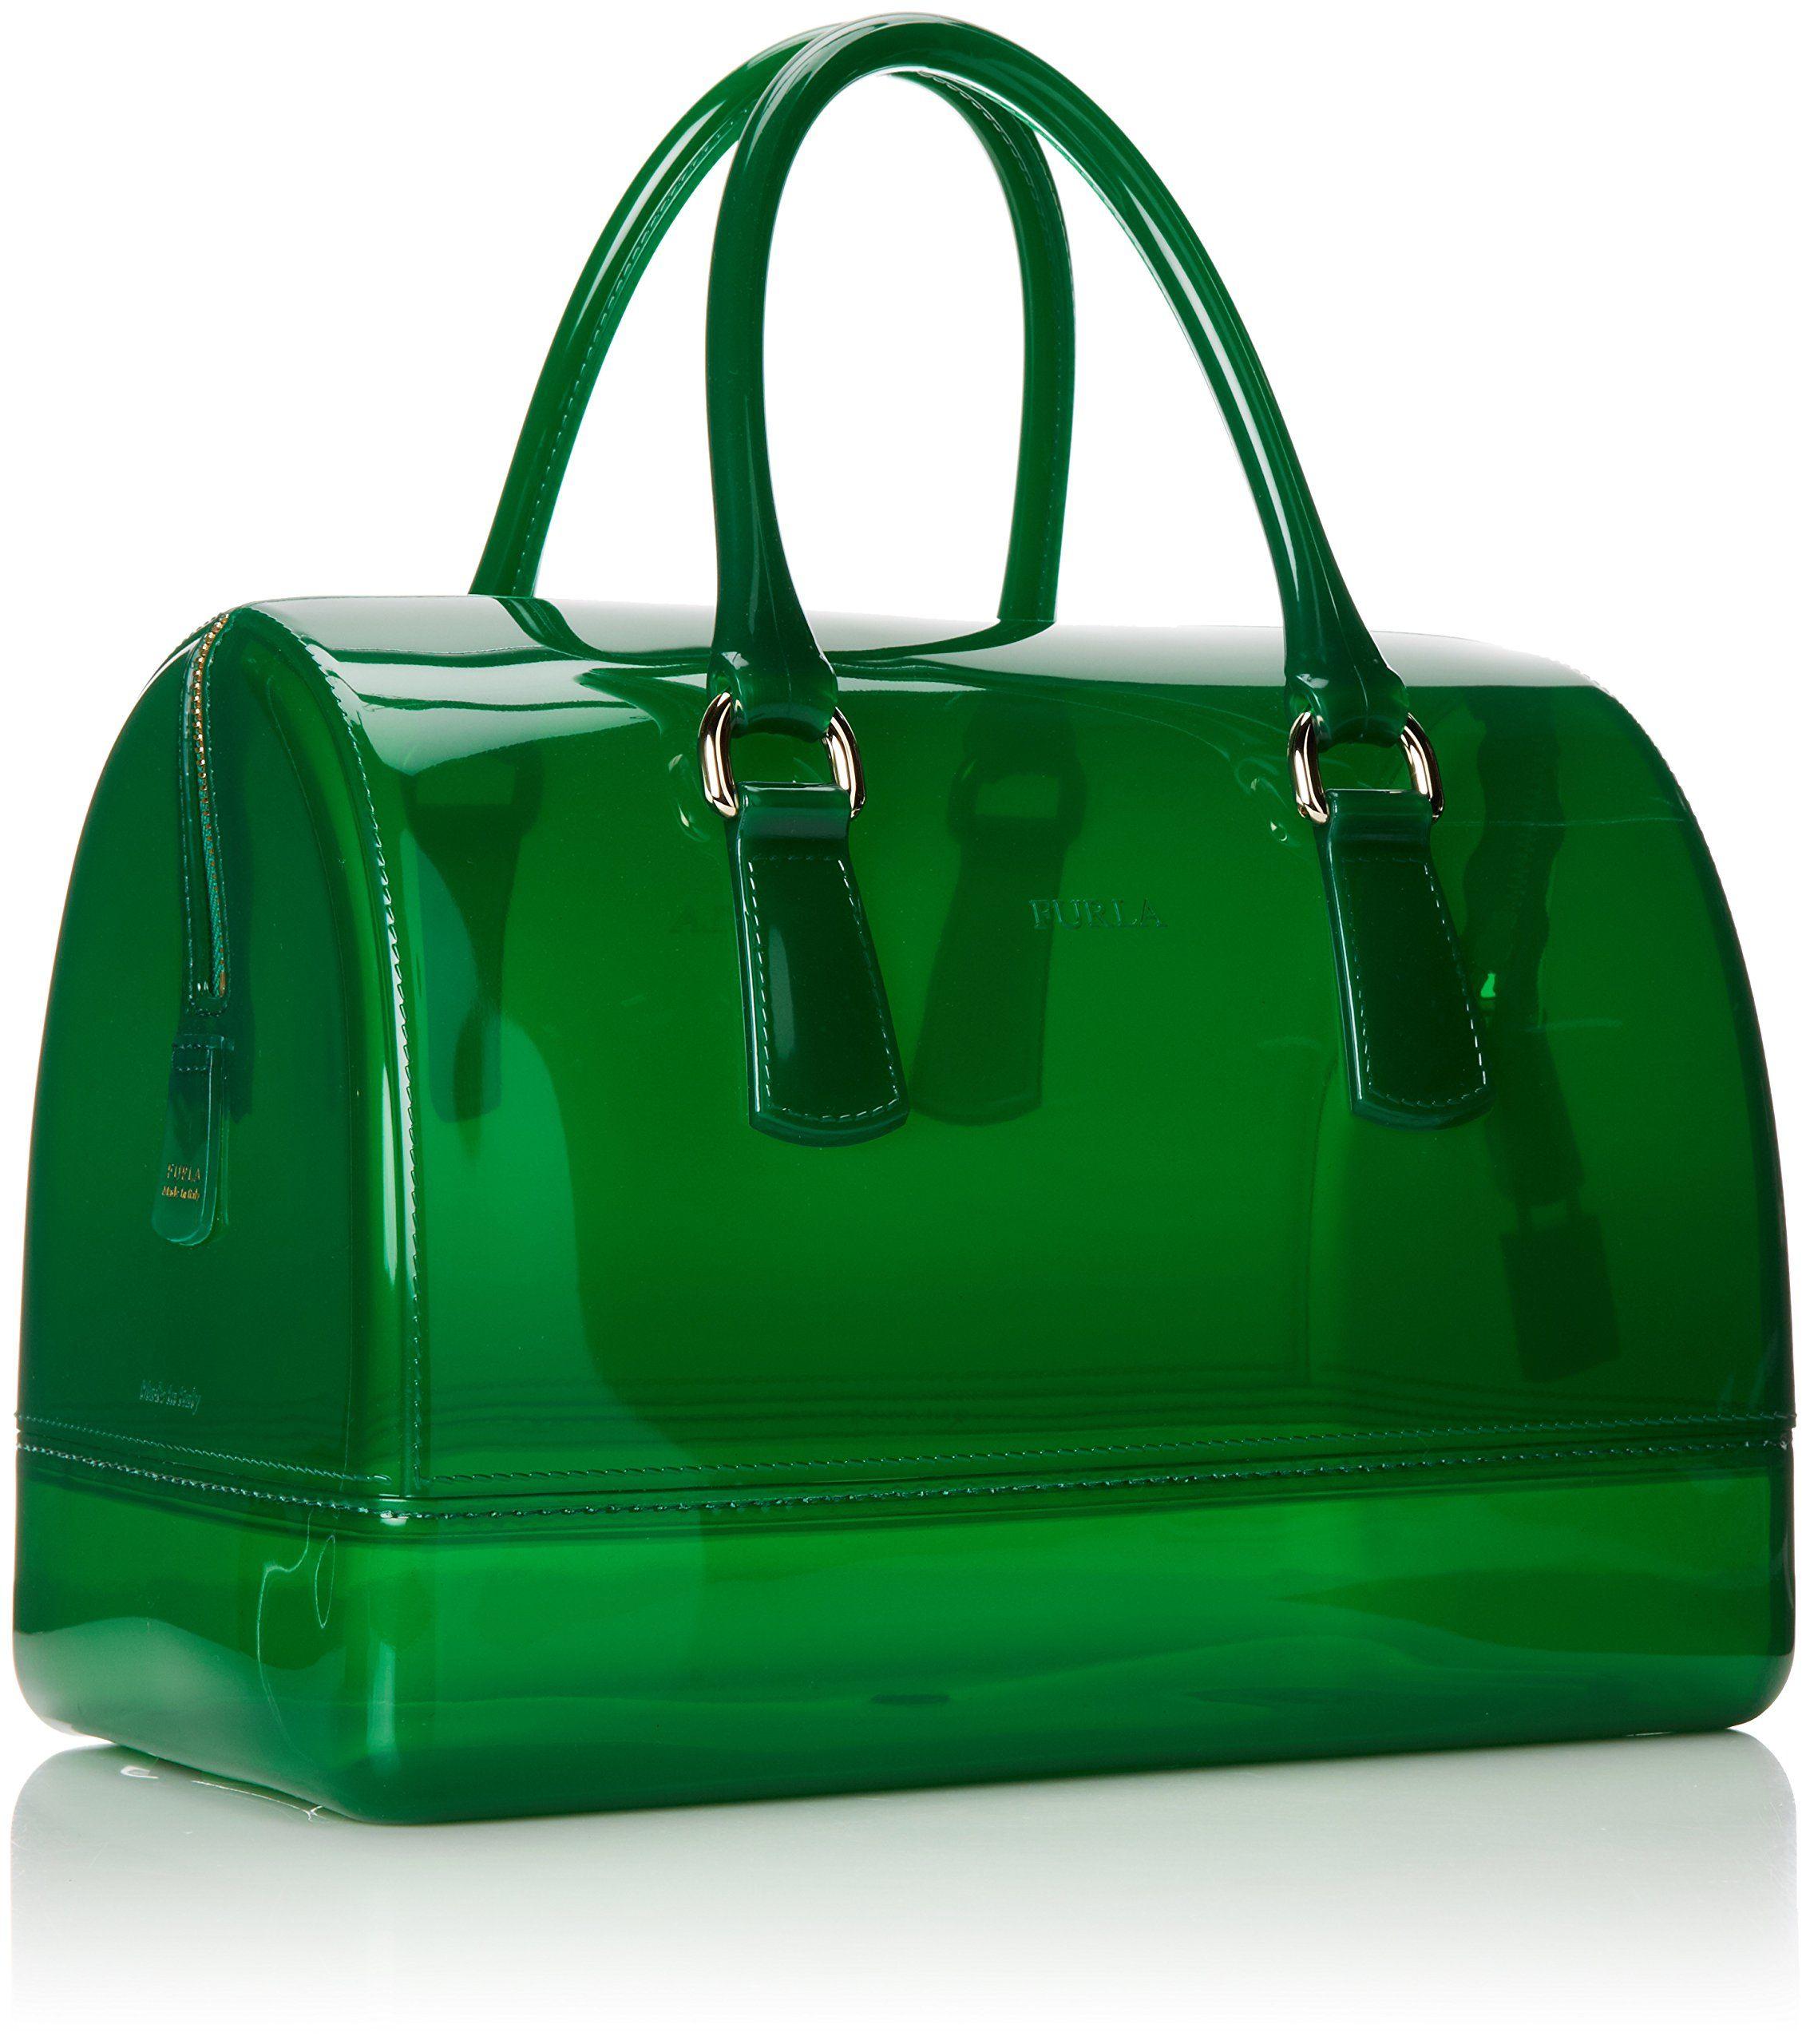 Amazon.com: Furla Candy Medium Satchel, Smeraldo/Green, One Size: Clothing